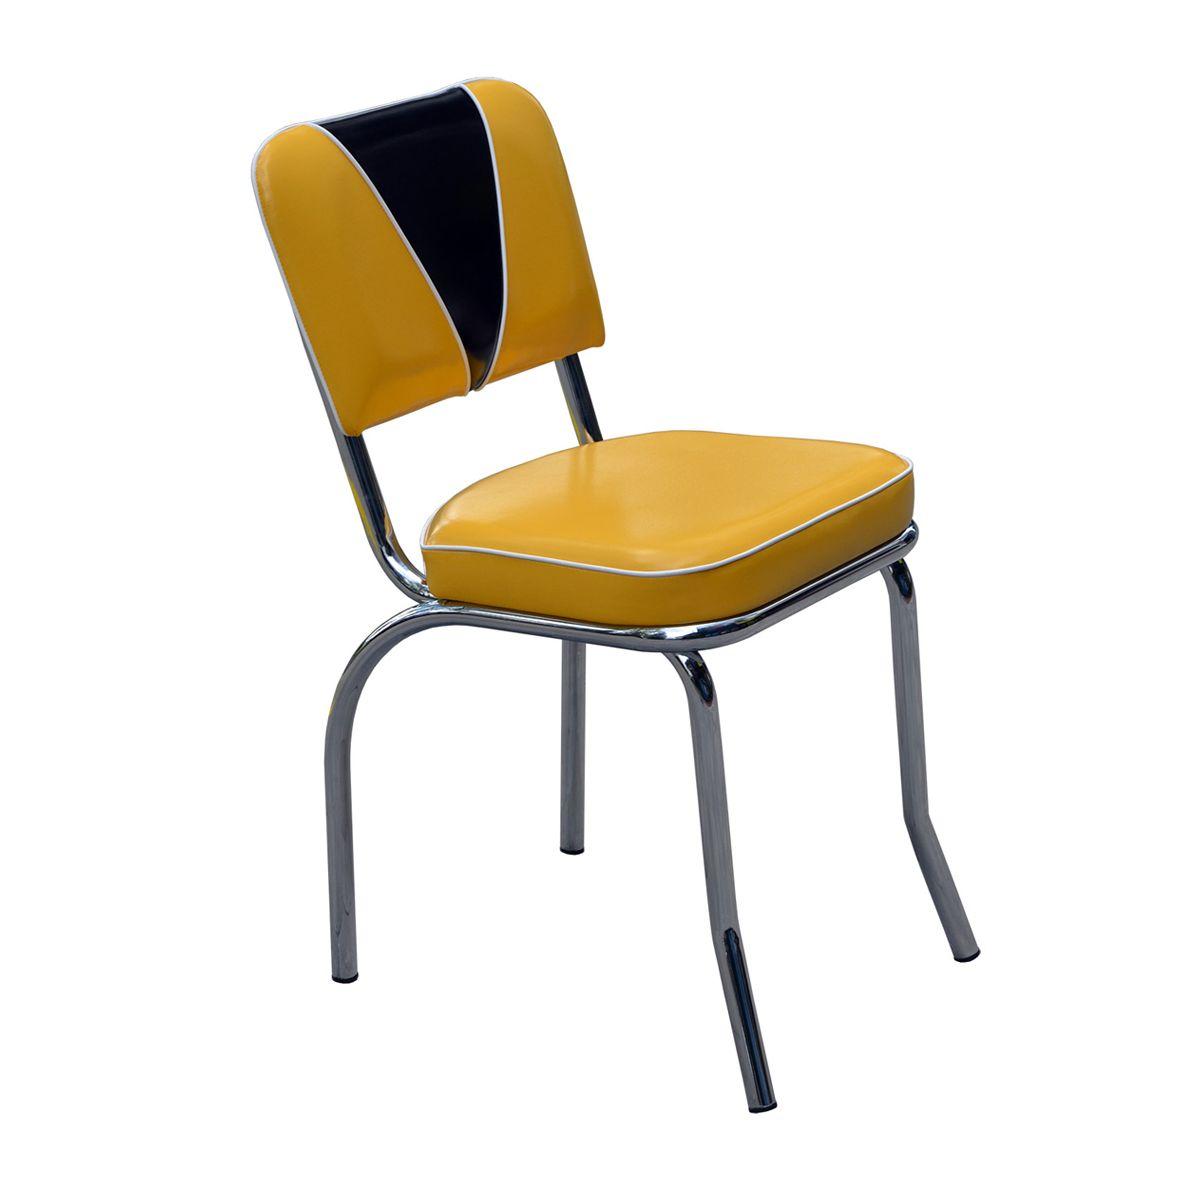 Vintage diner chair novio s334 9b american 50s diner chair for American diner chairs